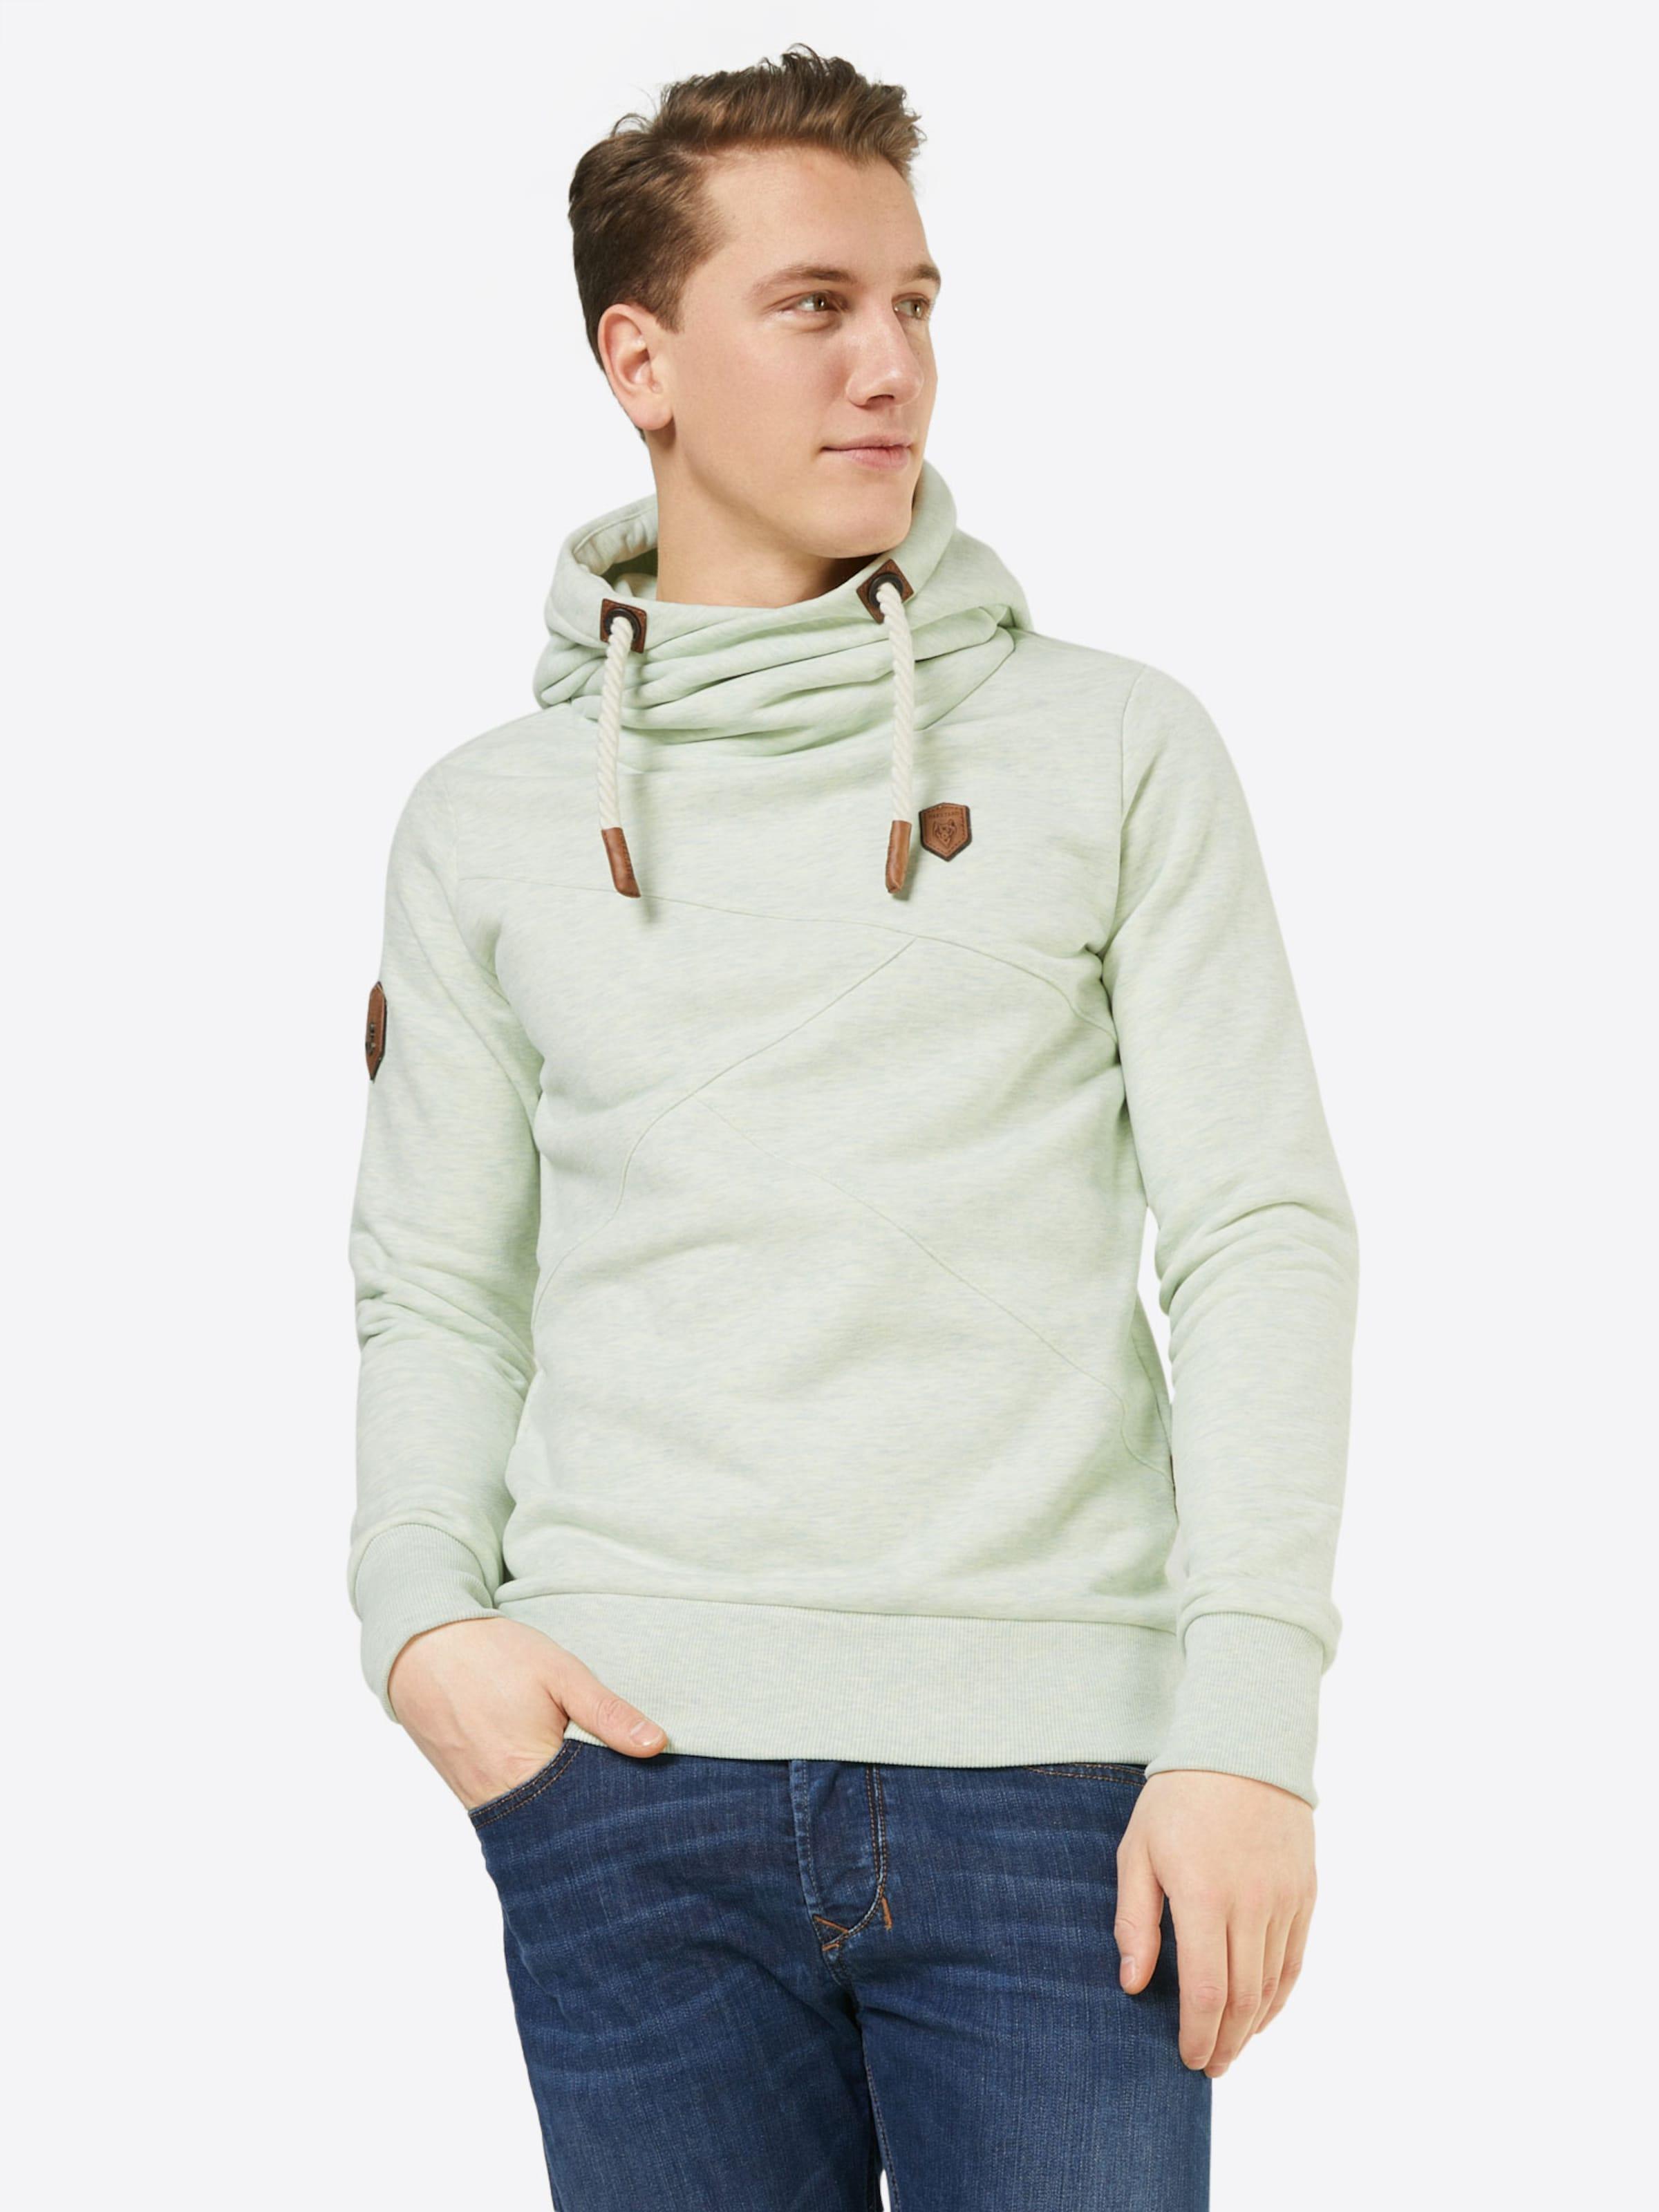 Naketano shirt Pastel Vert Sweat En 'lennox' D9eHIYWEb2